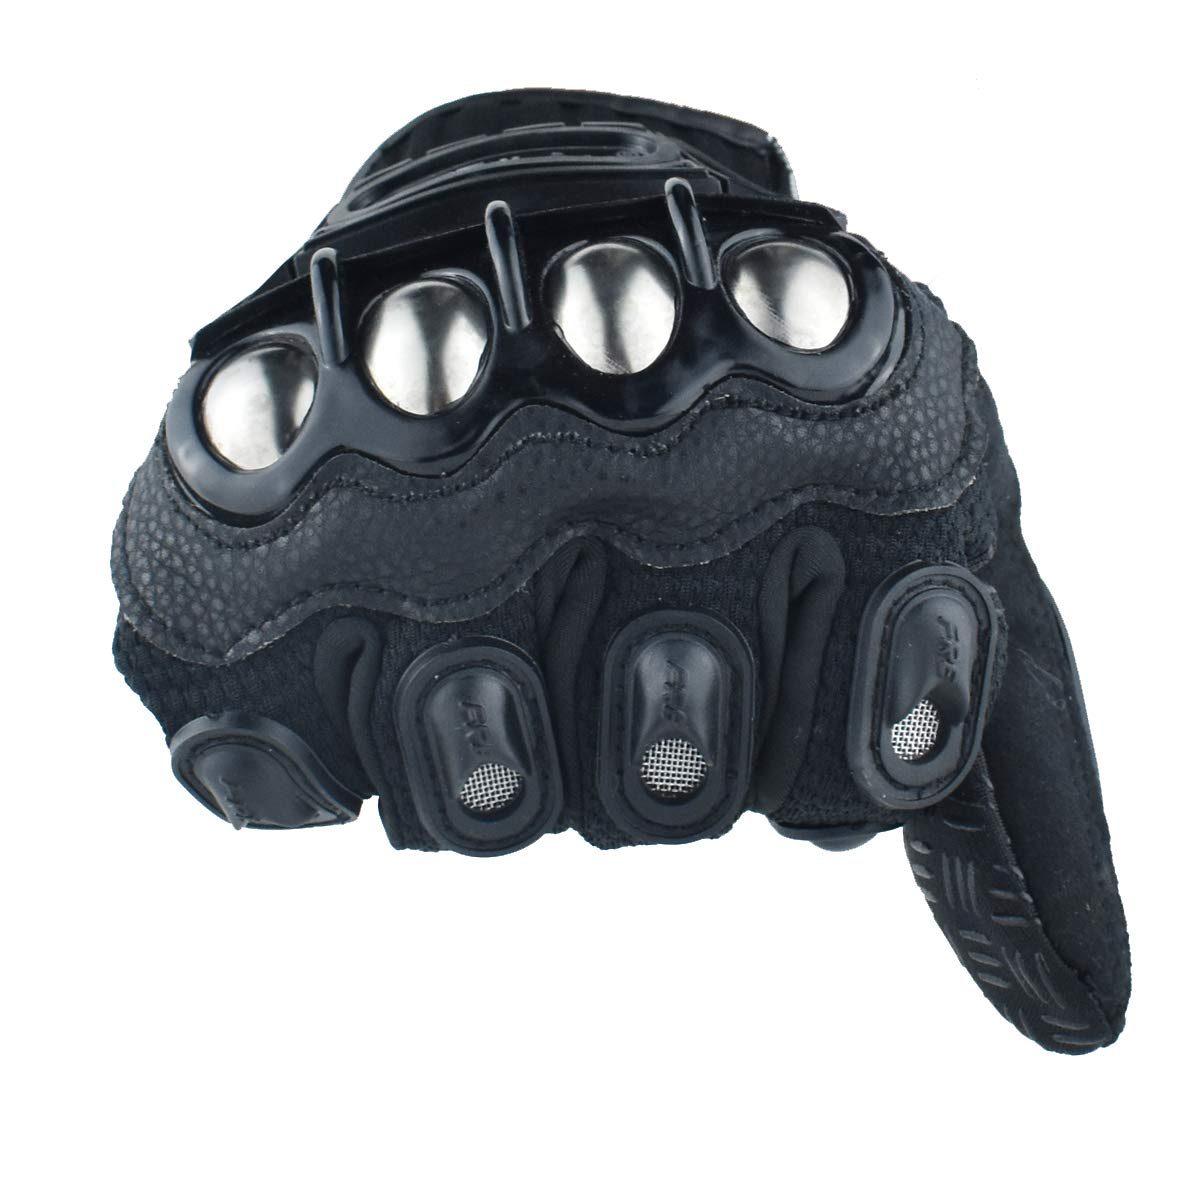 black XL madbike Powersports Motorcycle Motorbike Summer Gloves